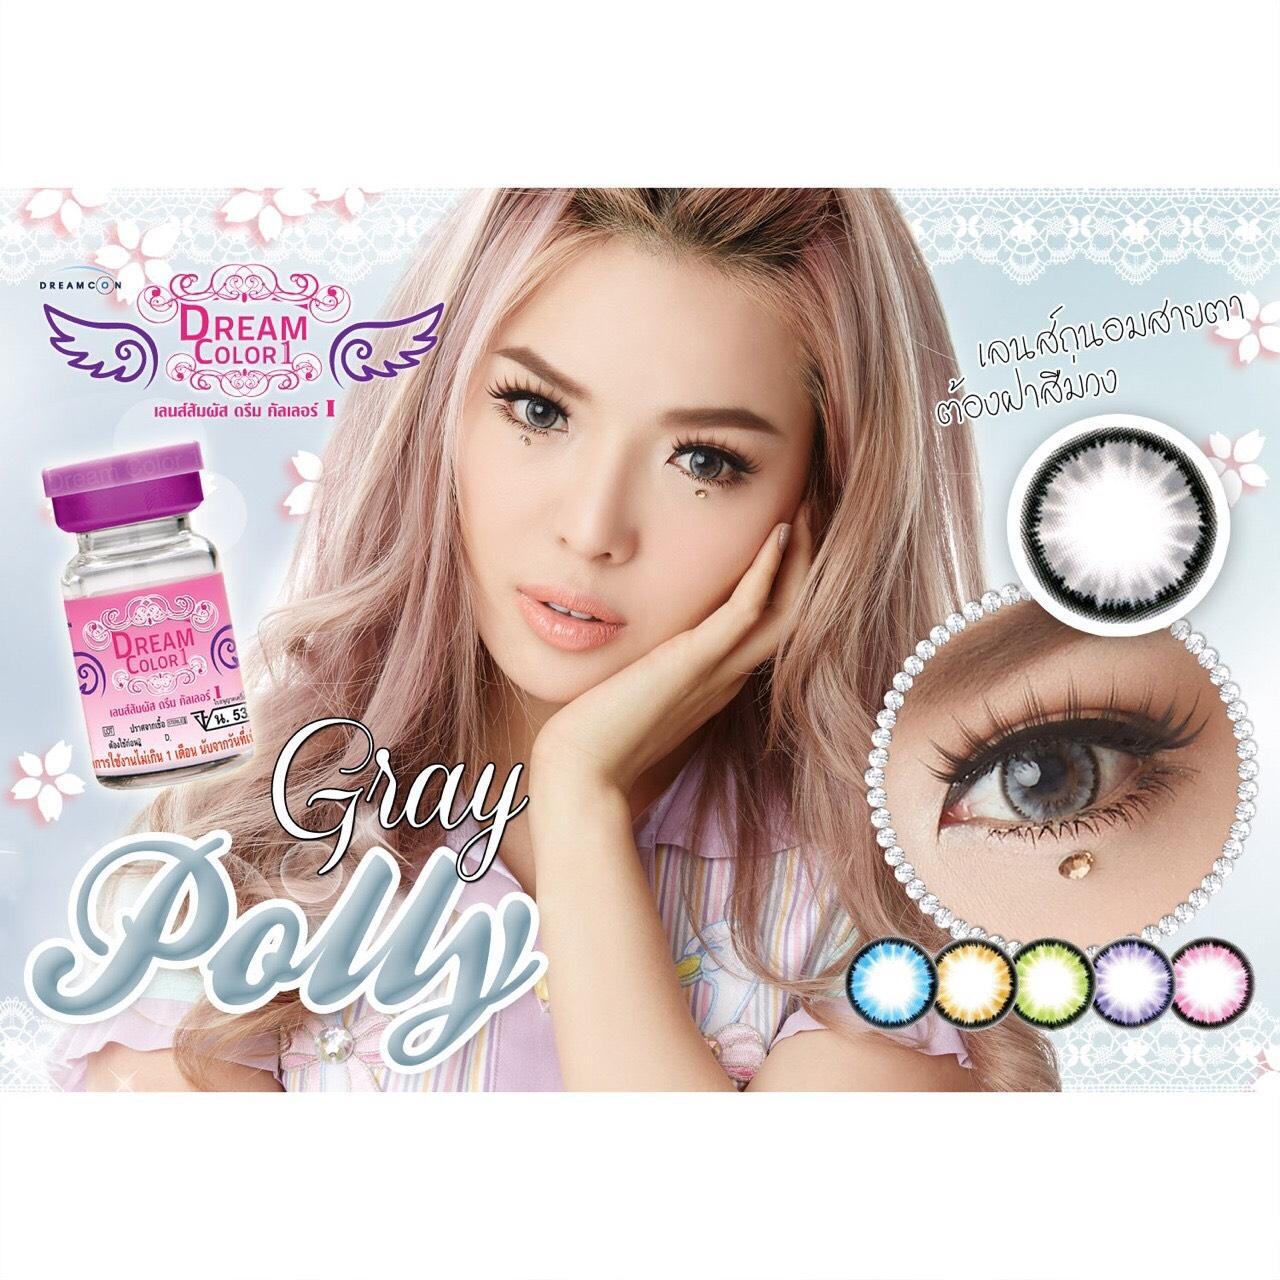 Polly Gray Dreamcolor1เลนส์นิ่มใส่สบาย คอนแทคเลนส์ ขายส่งคอนแทคเลนส์ ขายส่งBigeye Bigeyeเกาหลี